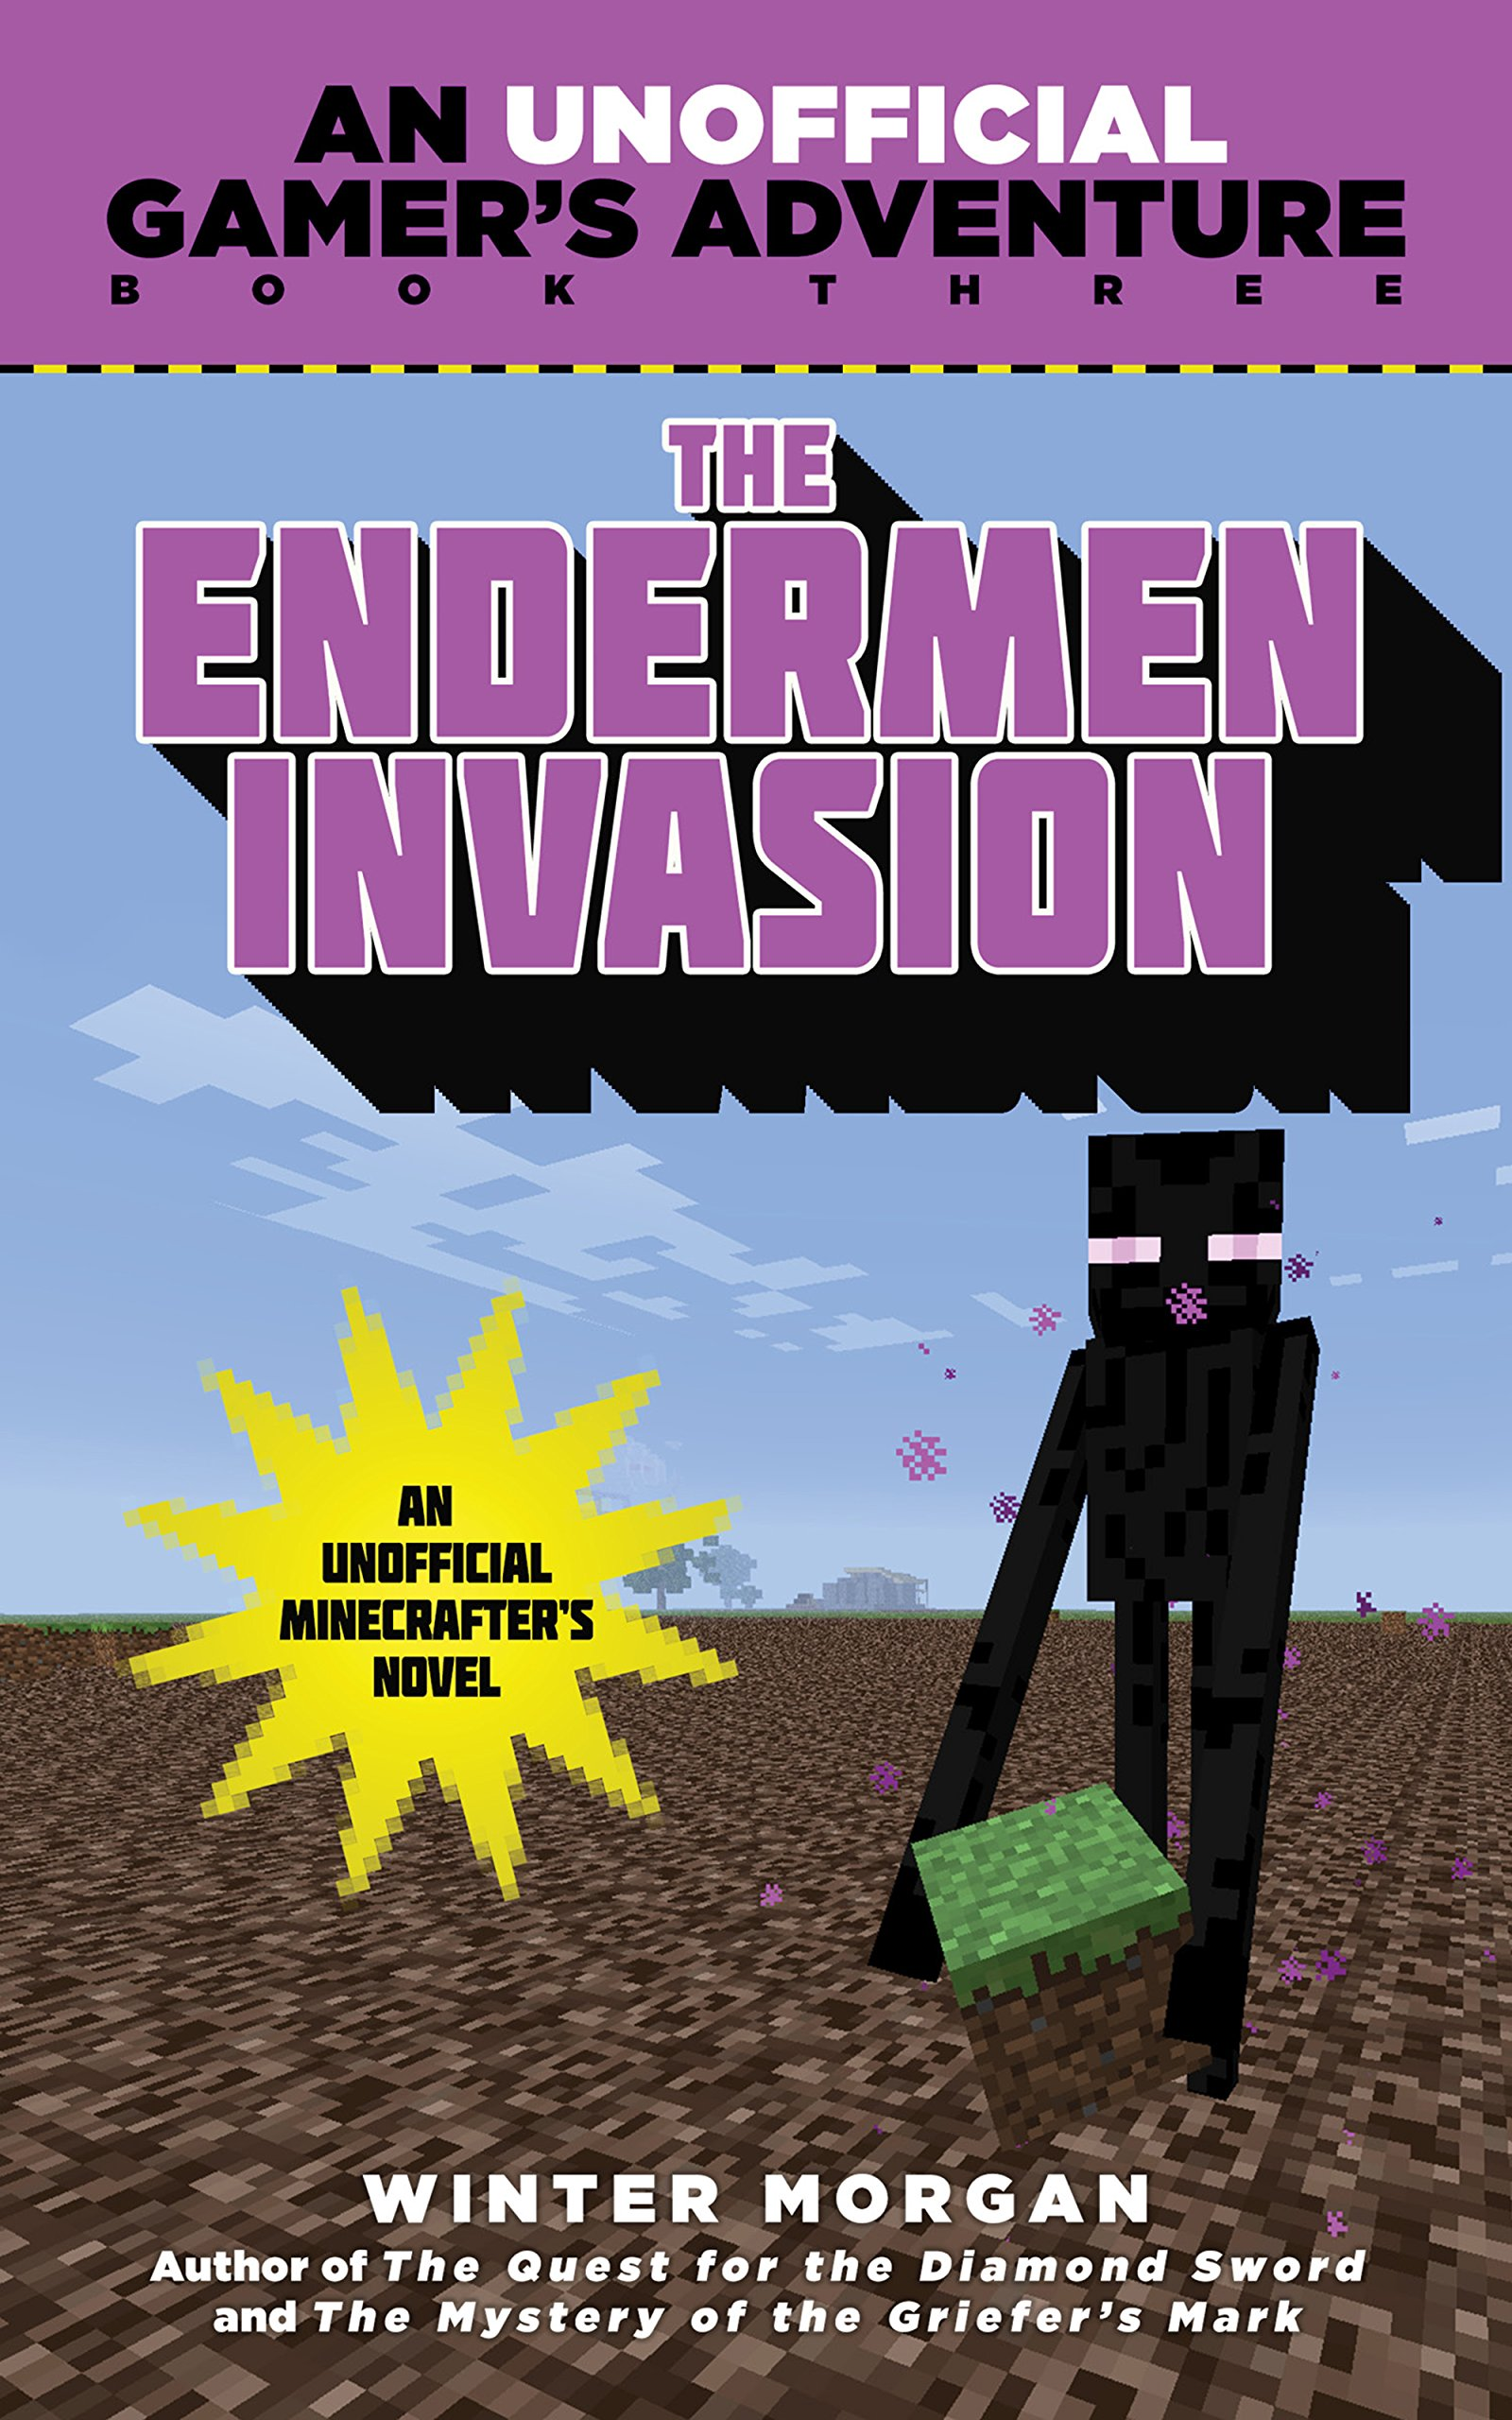 The Endermen Invasion: An Unofficial Gamer's Adventure, Book Three pdf